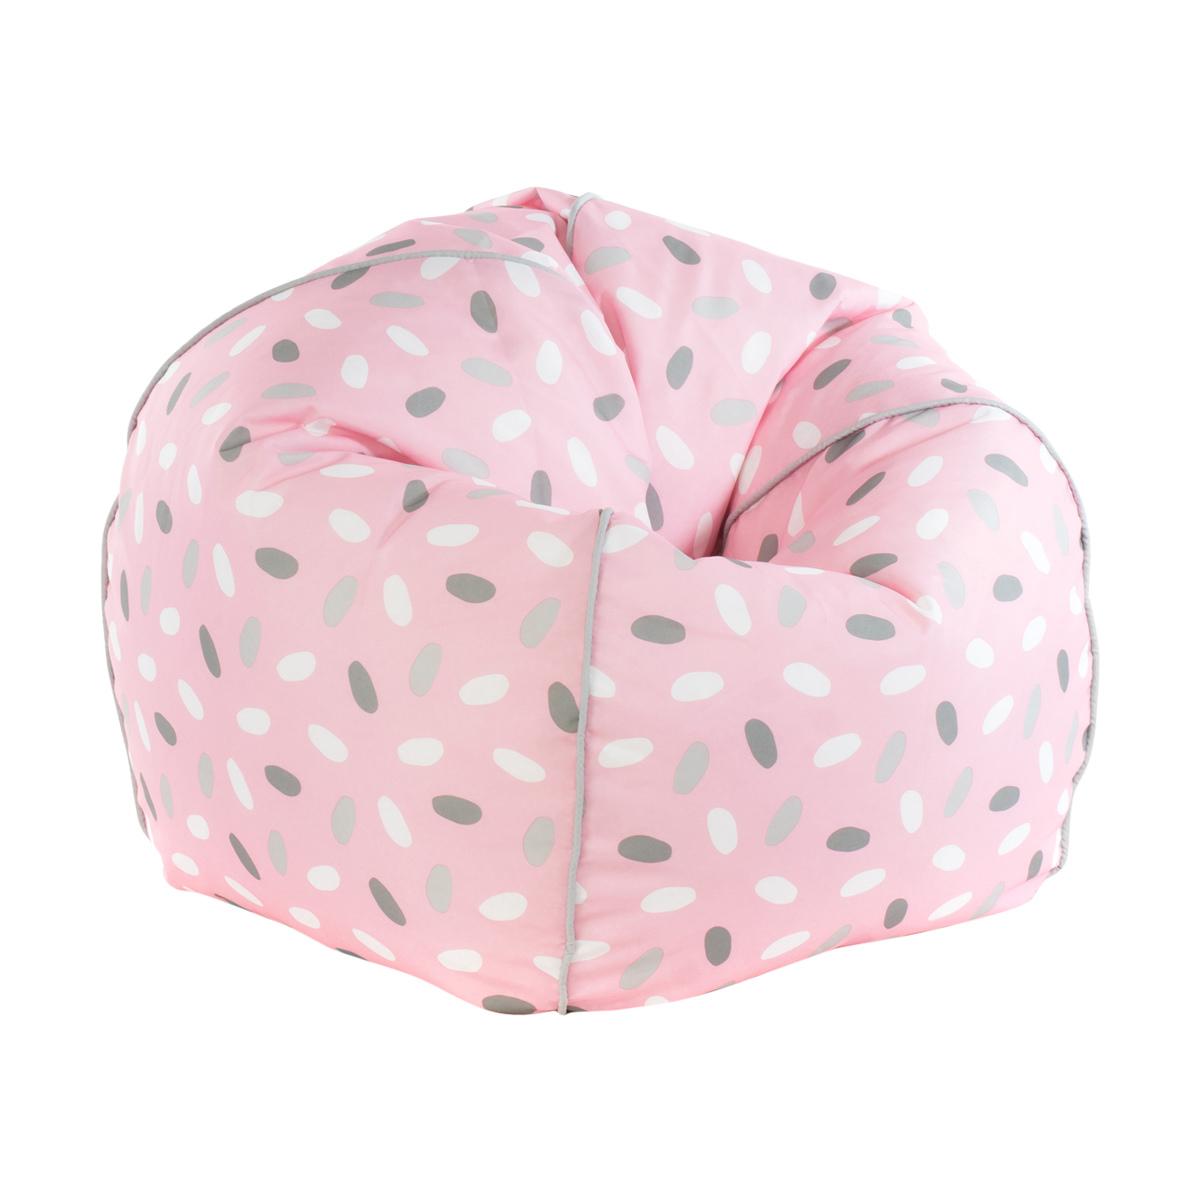 resistant water pink bag kicky gaming products chair guru bean mattress